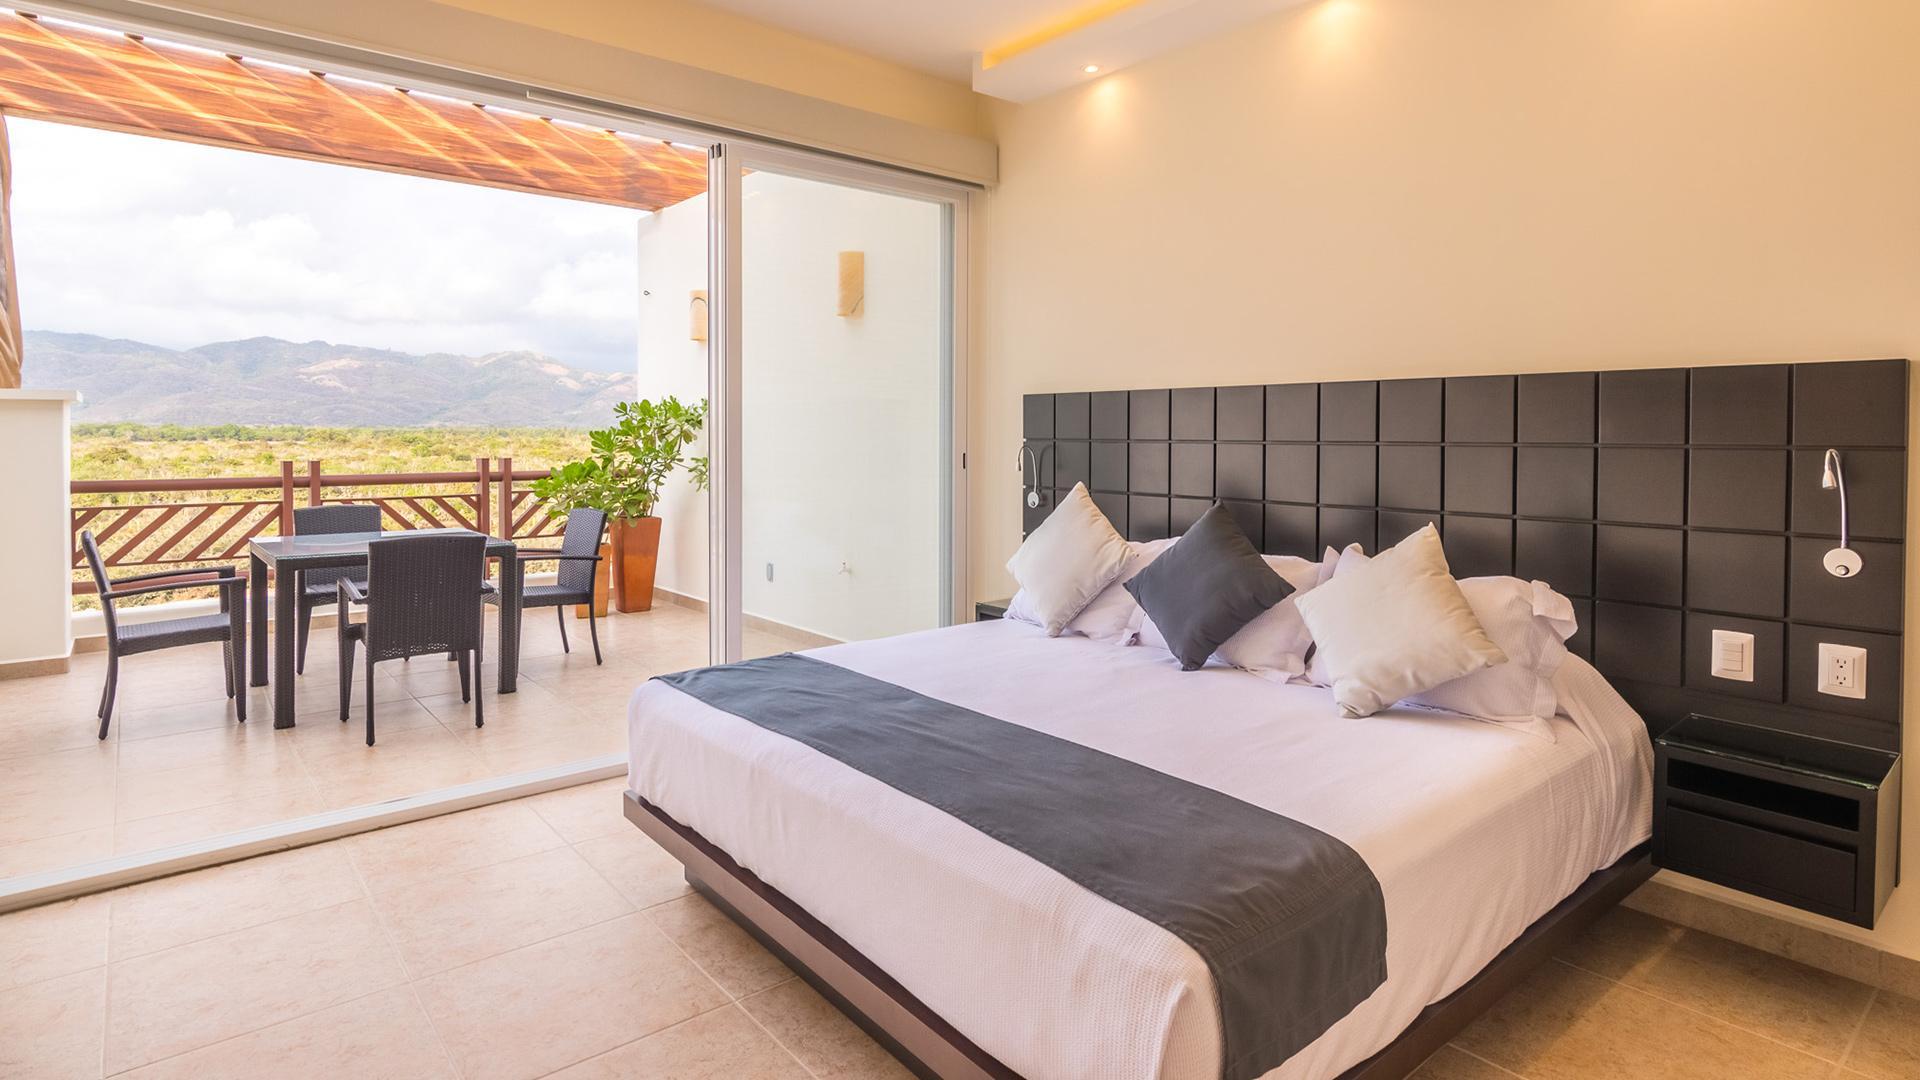 Mountain View Studio image 1 at Vivo Resorts by null, Oaxaca, Mexico